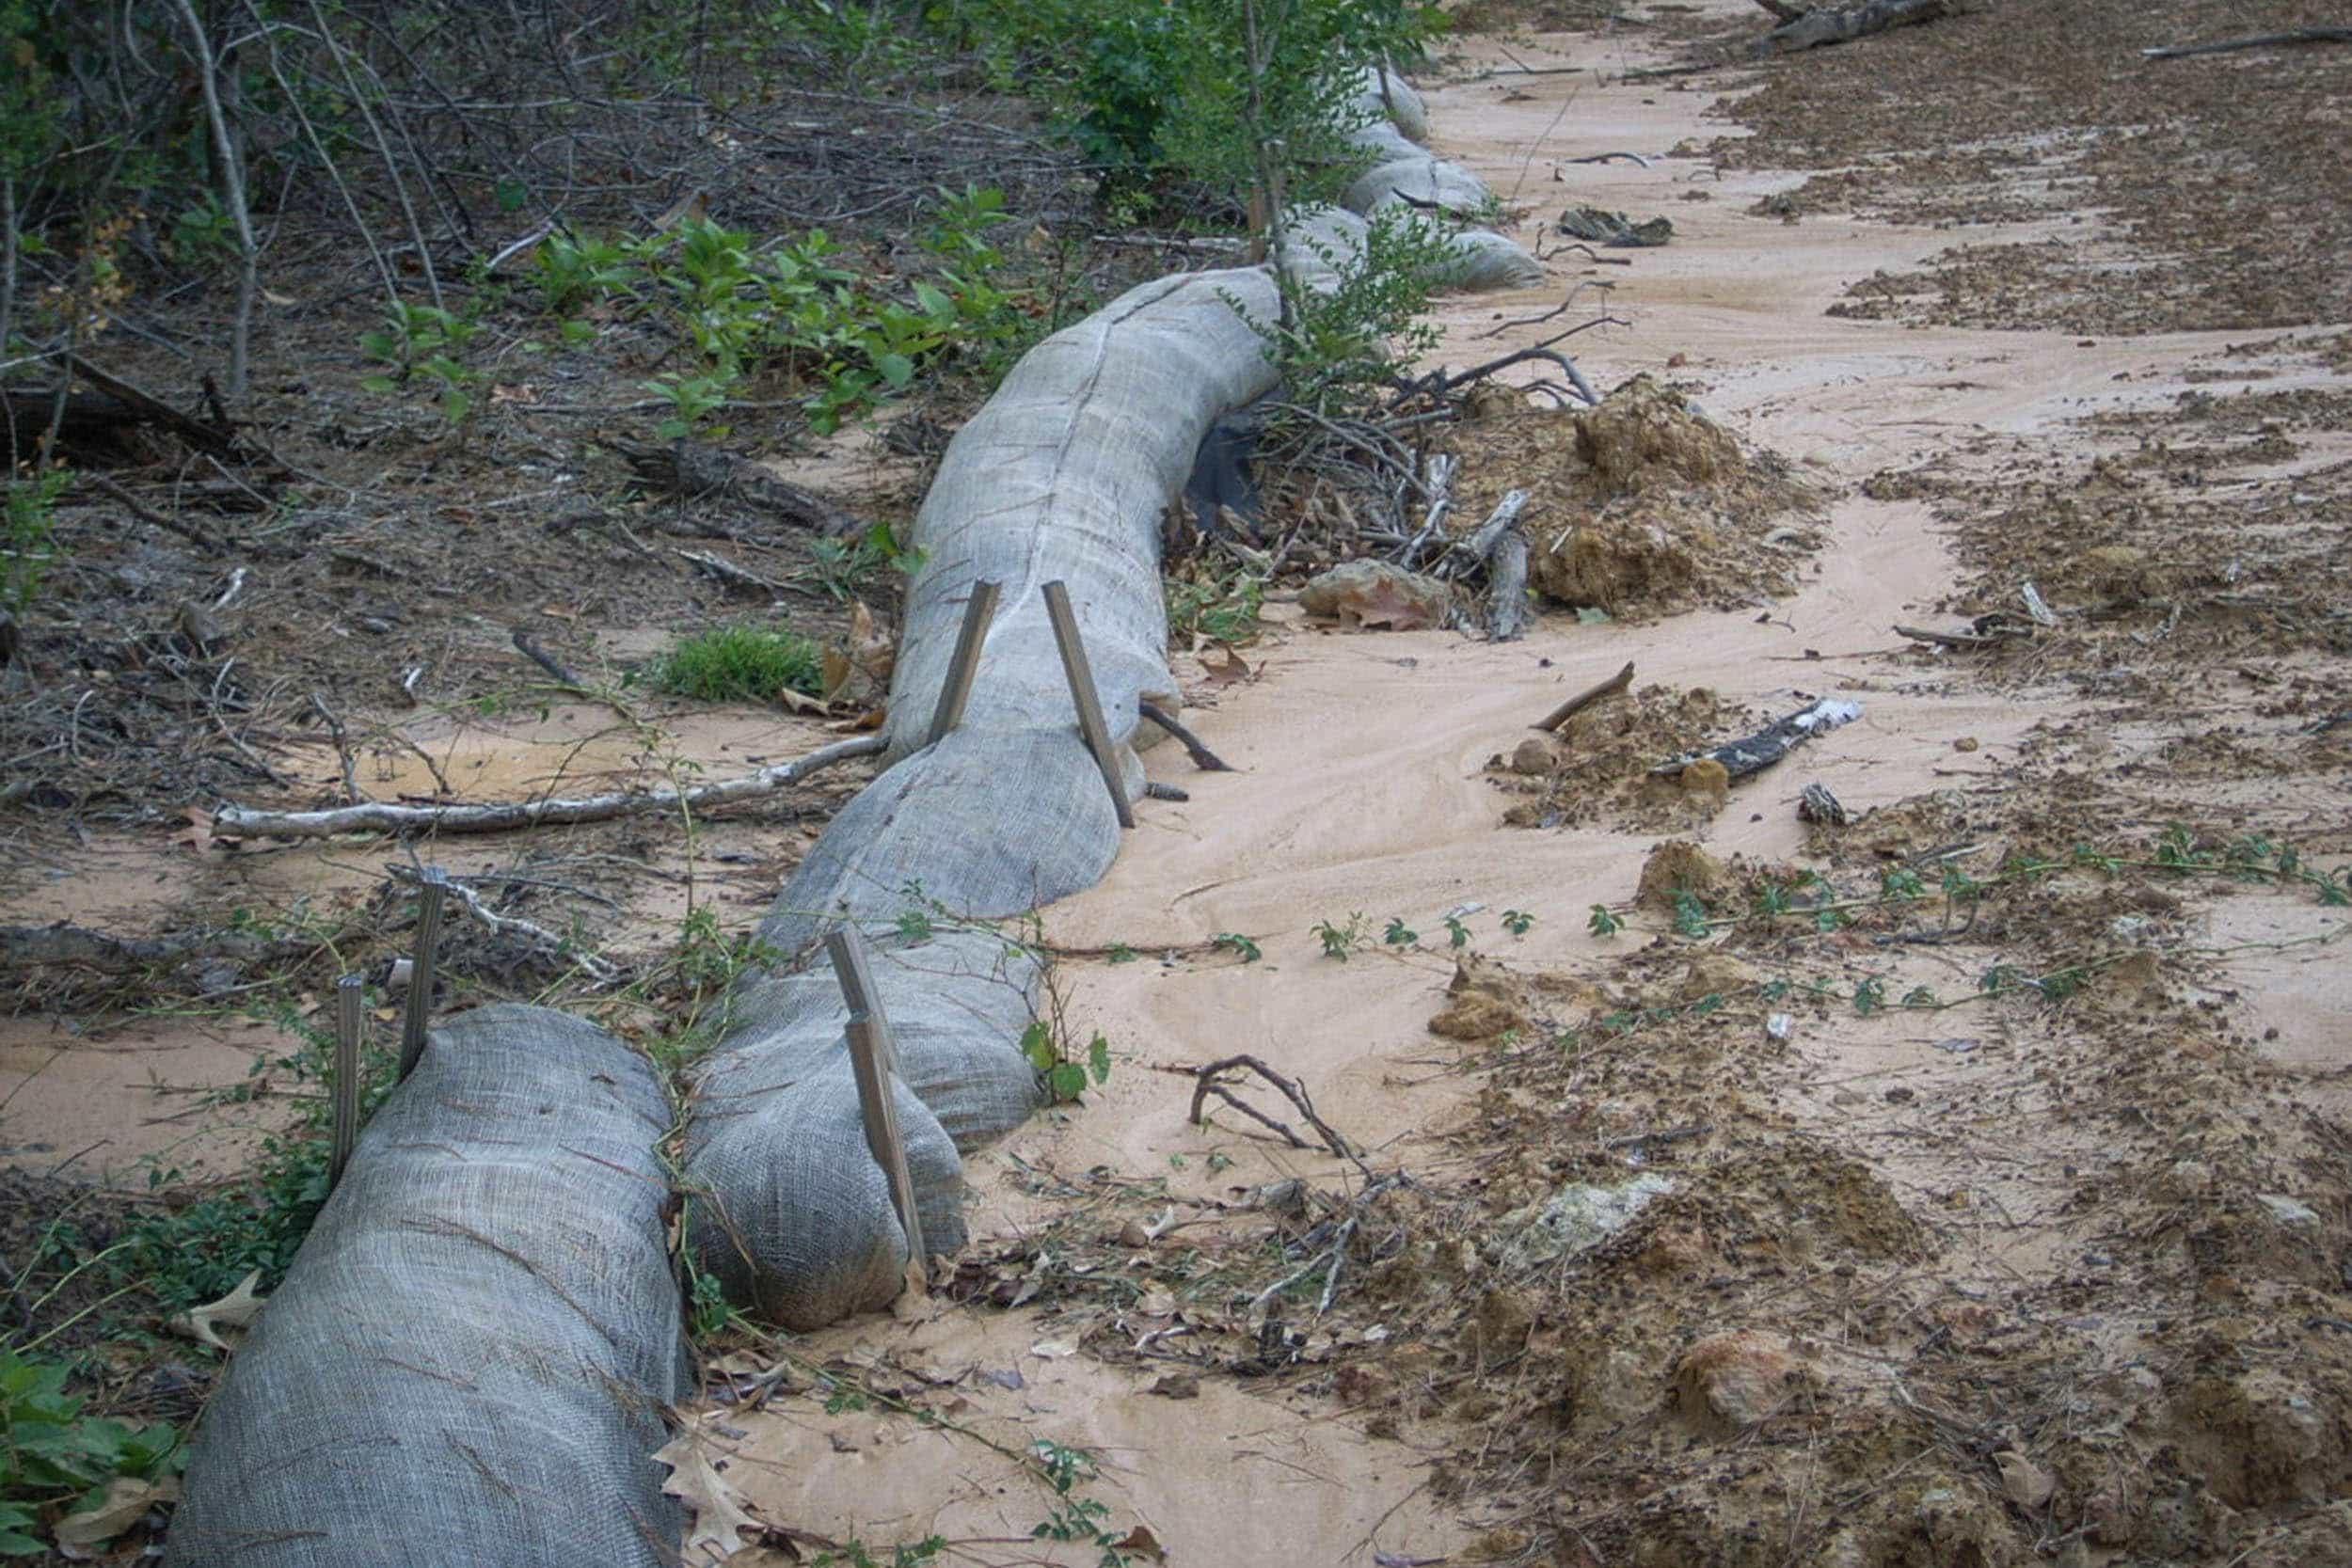 Construction activity upstream of sampler at site 1, September 19, 2011.